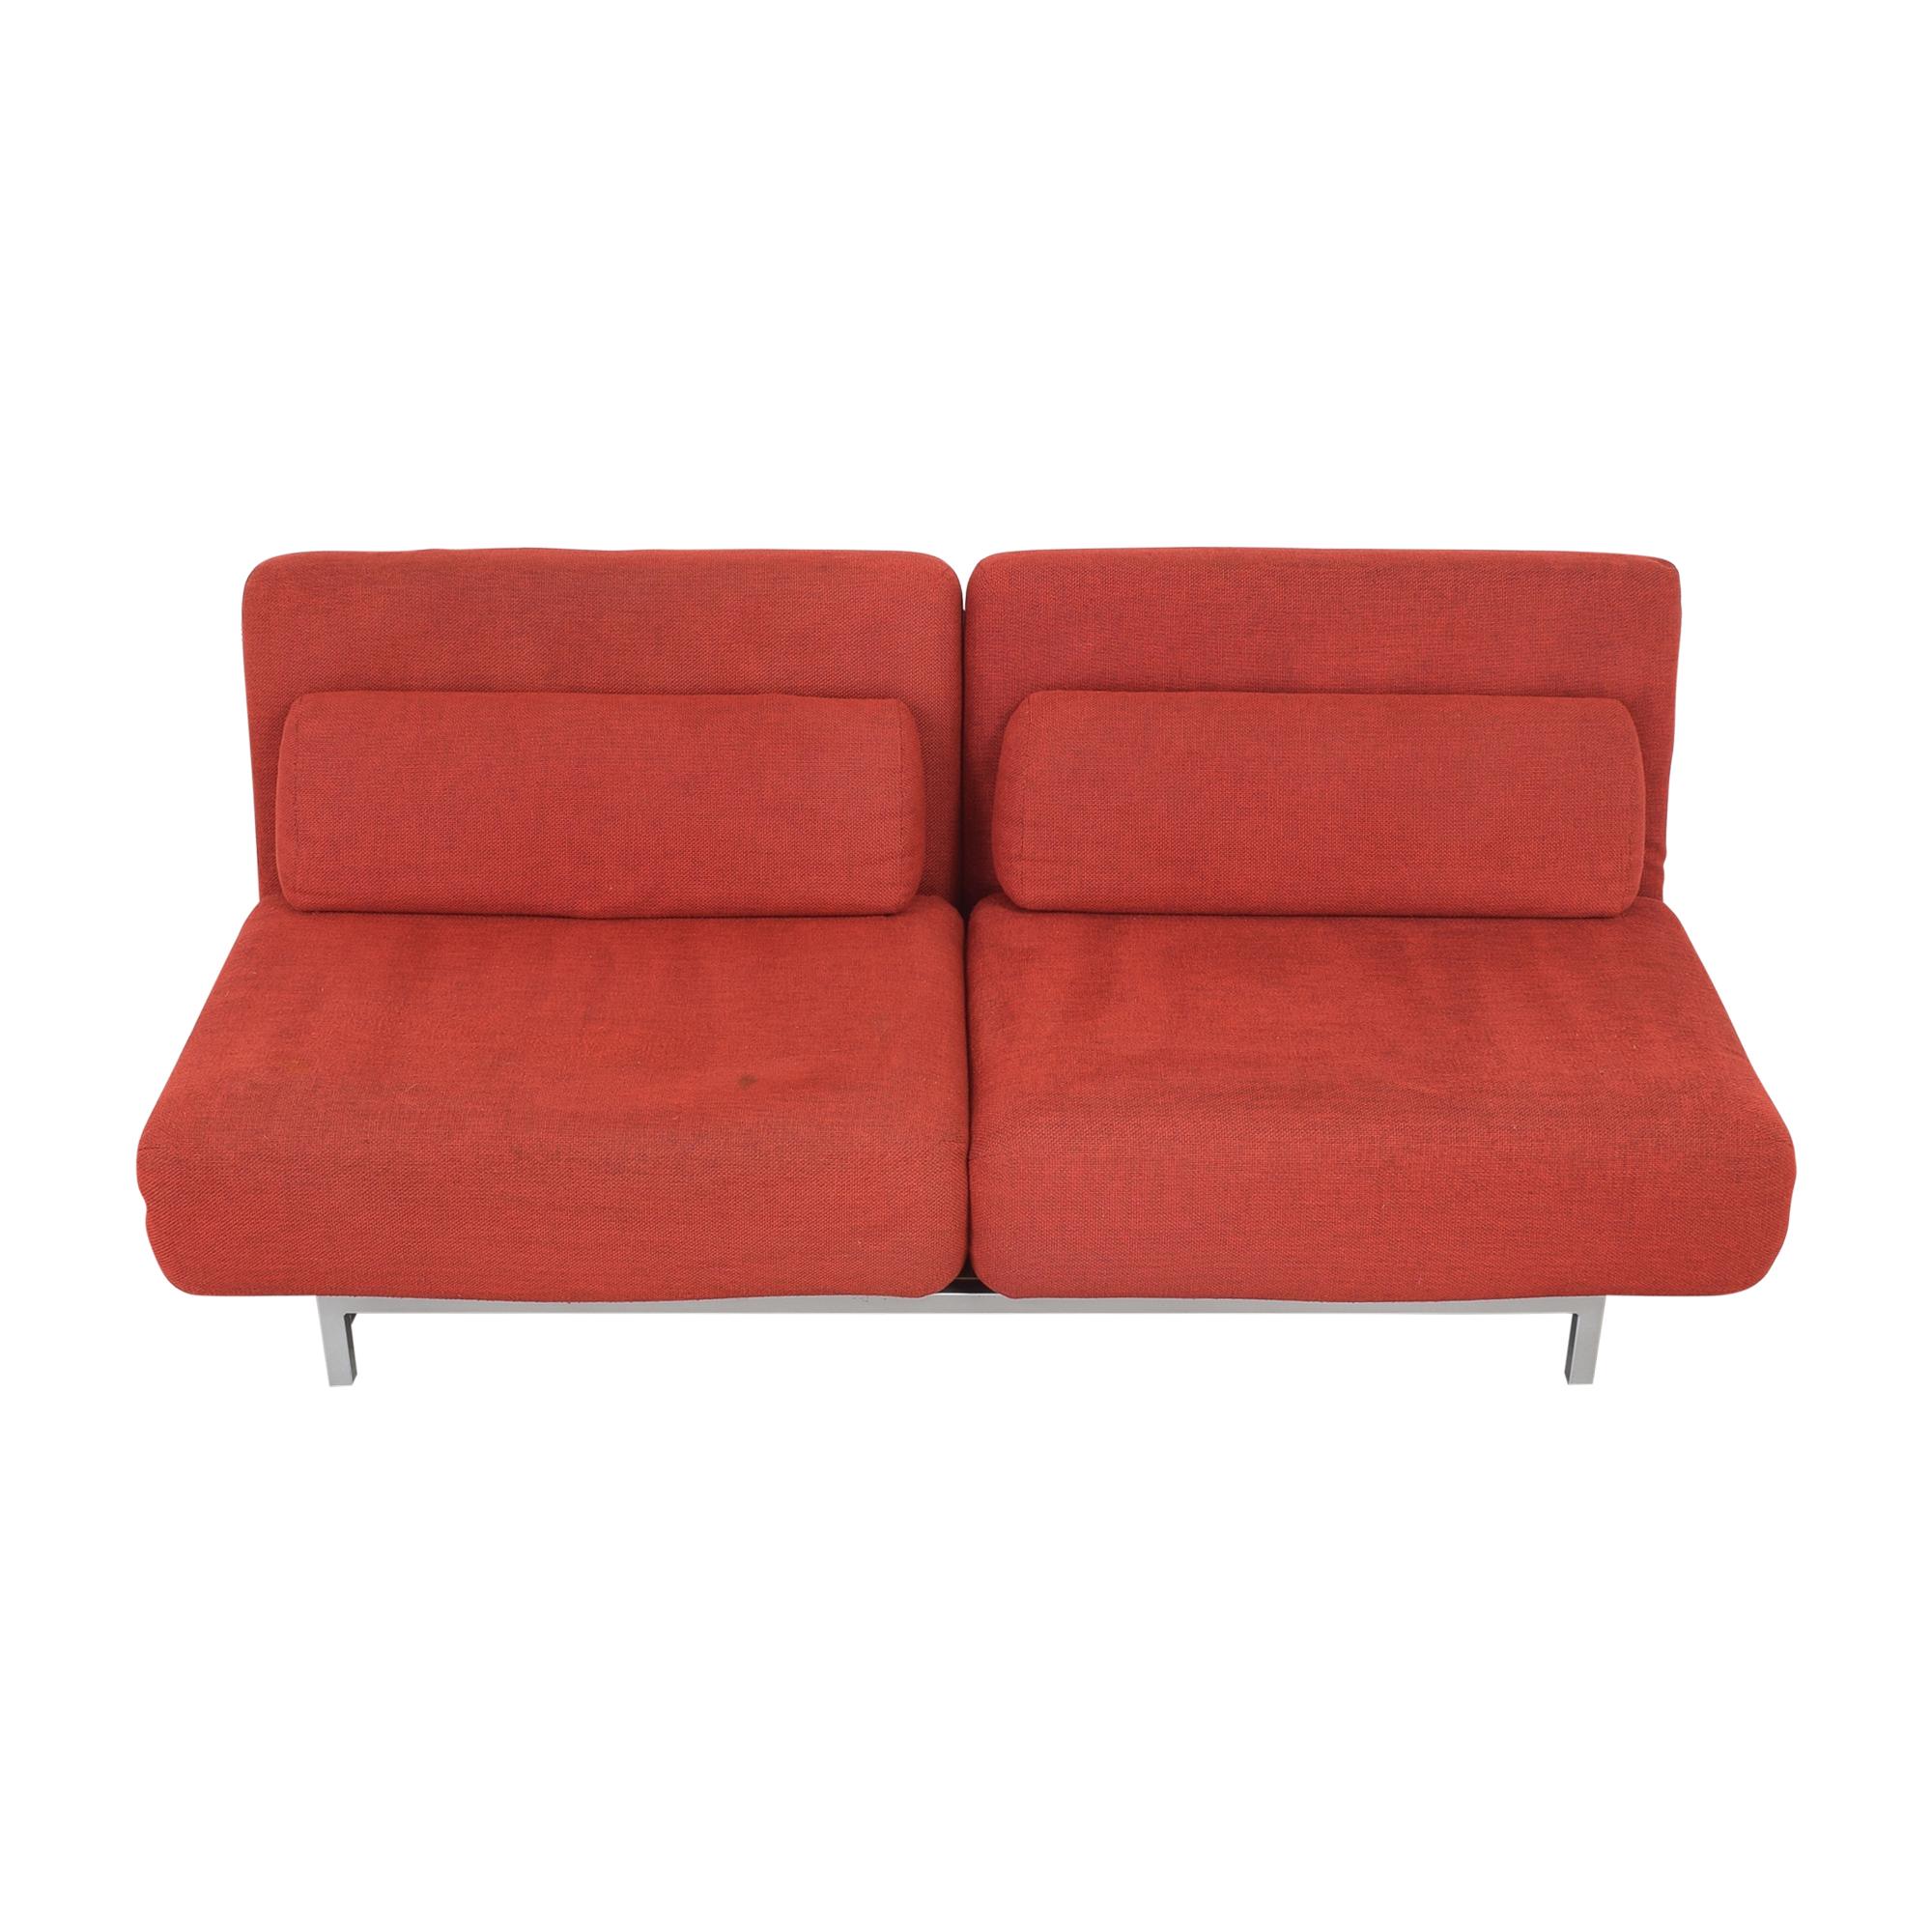 IDO IDO Swivel Convertible Sofa Bed